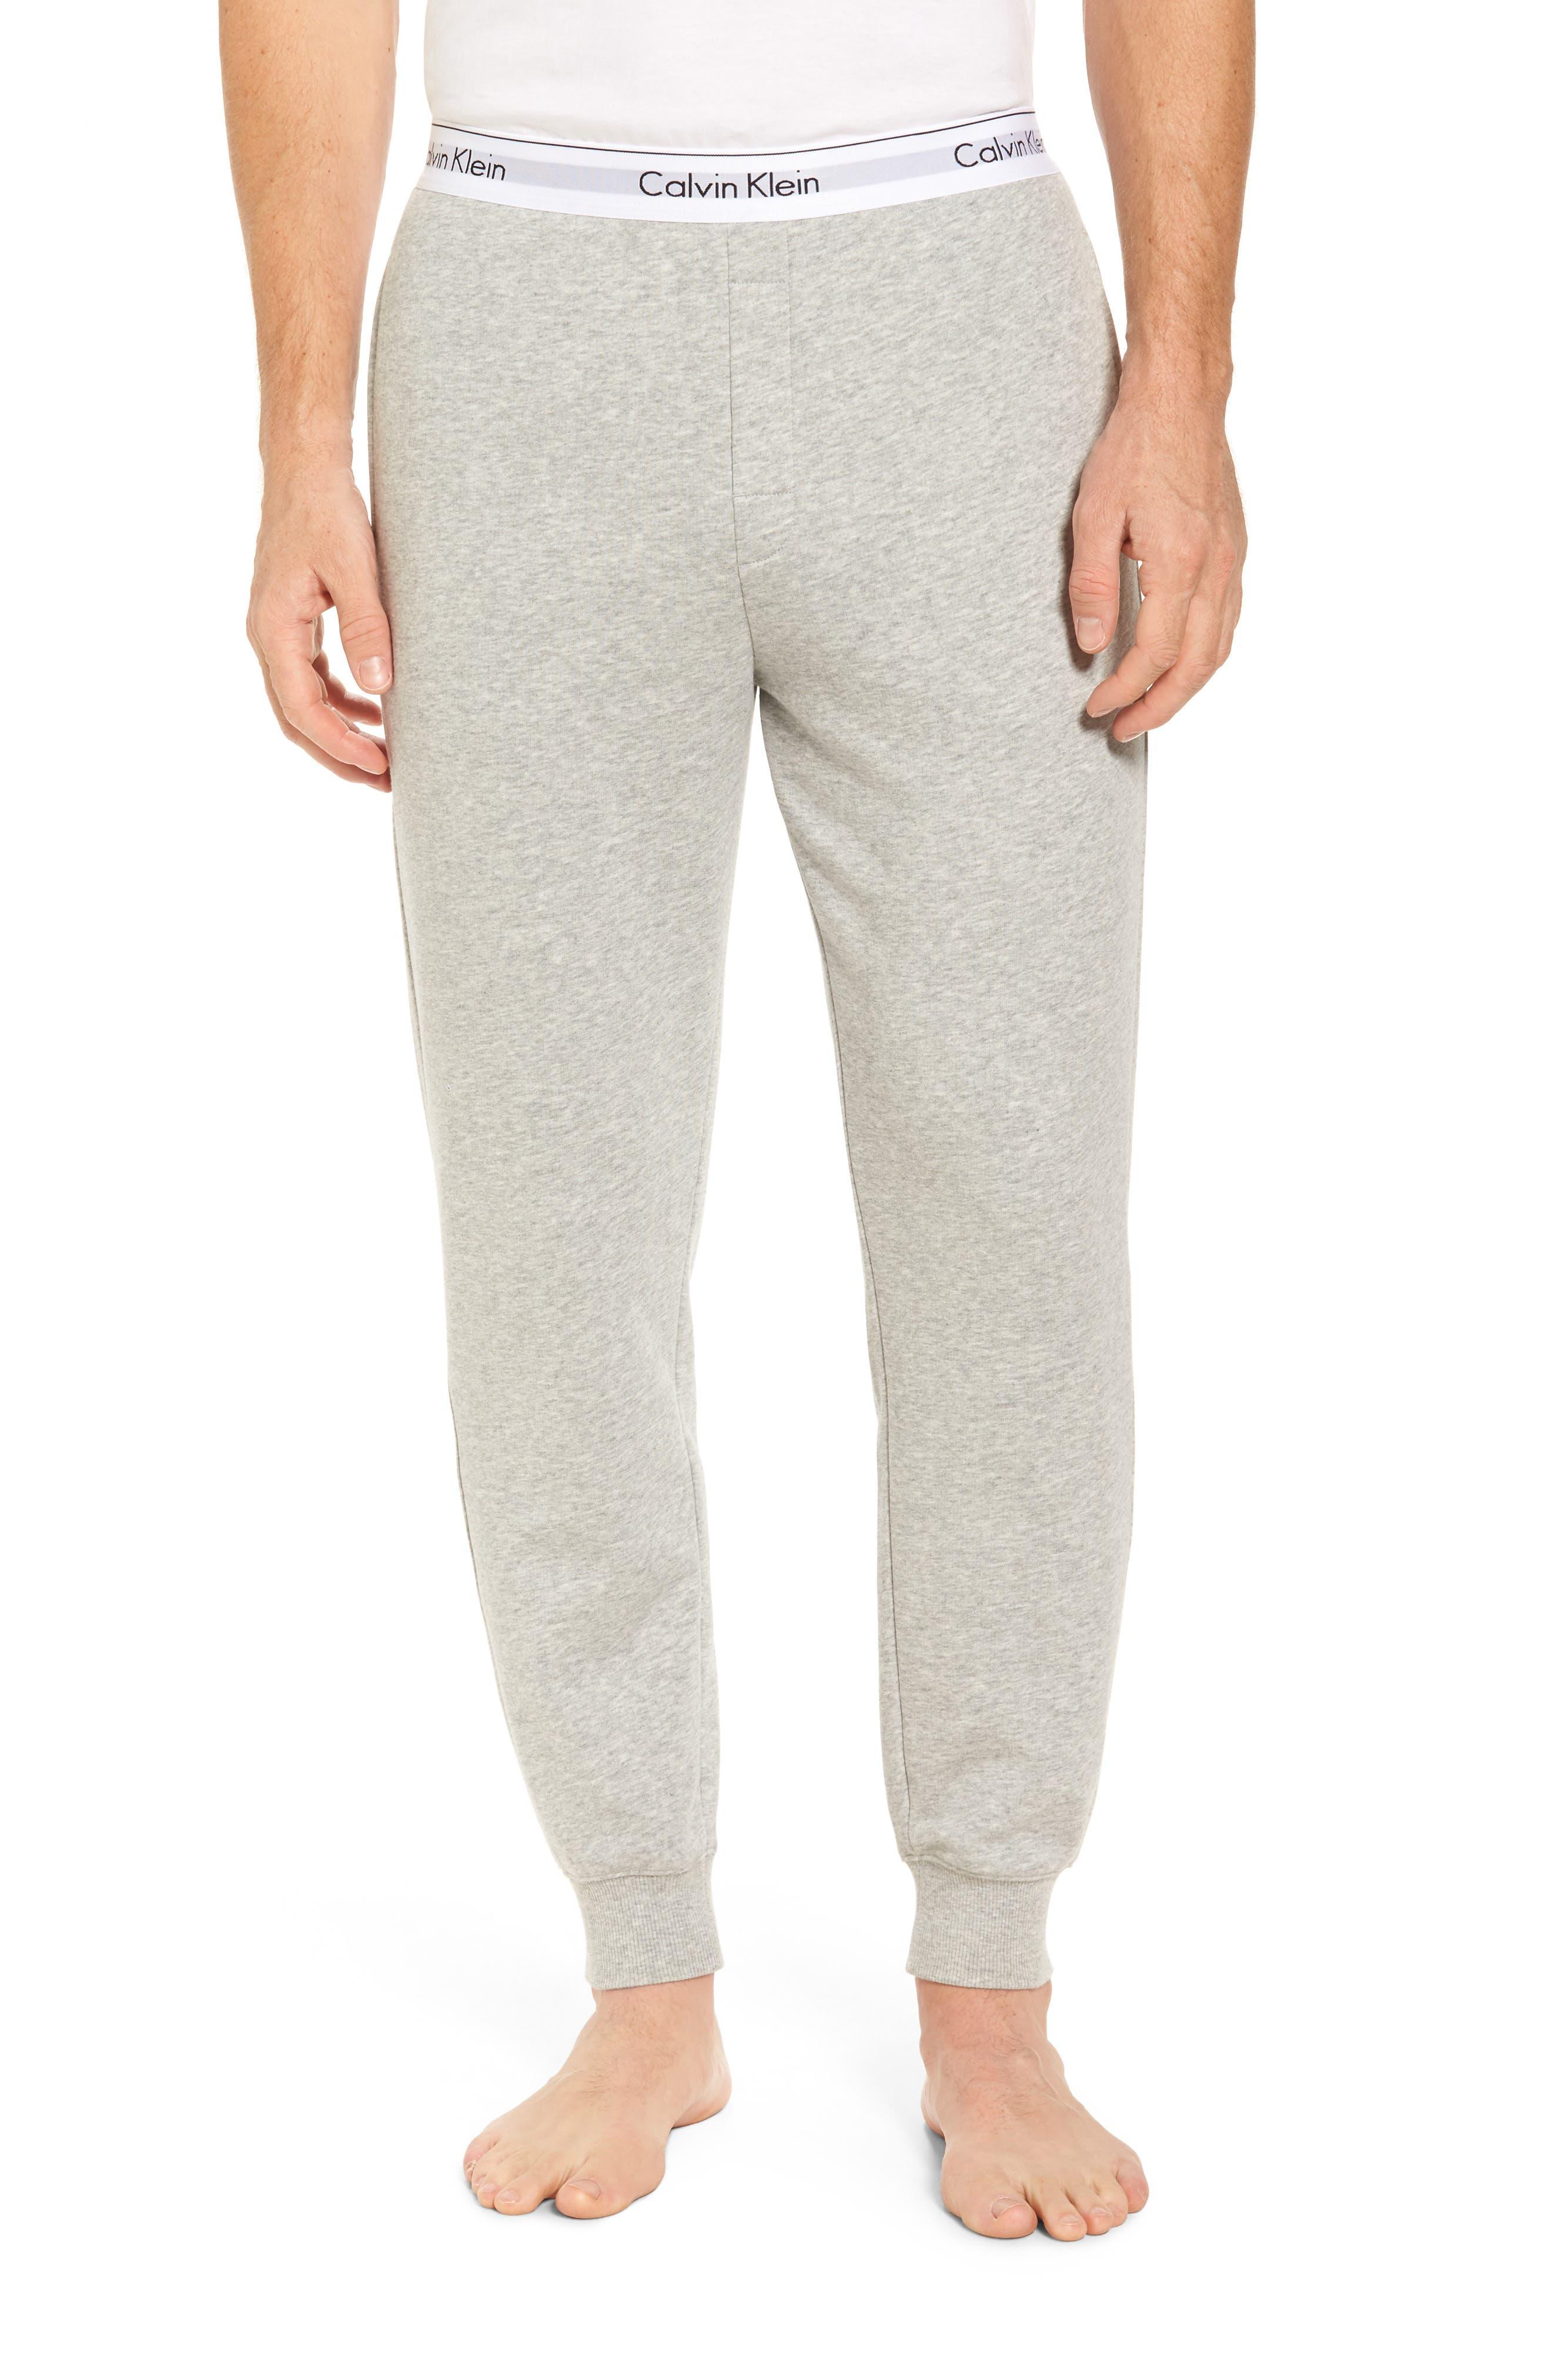 Modern Cotton Blend Lounge Pants,                             Main thumbnail 1, color,                             Grey Heather